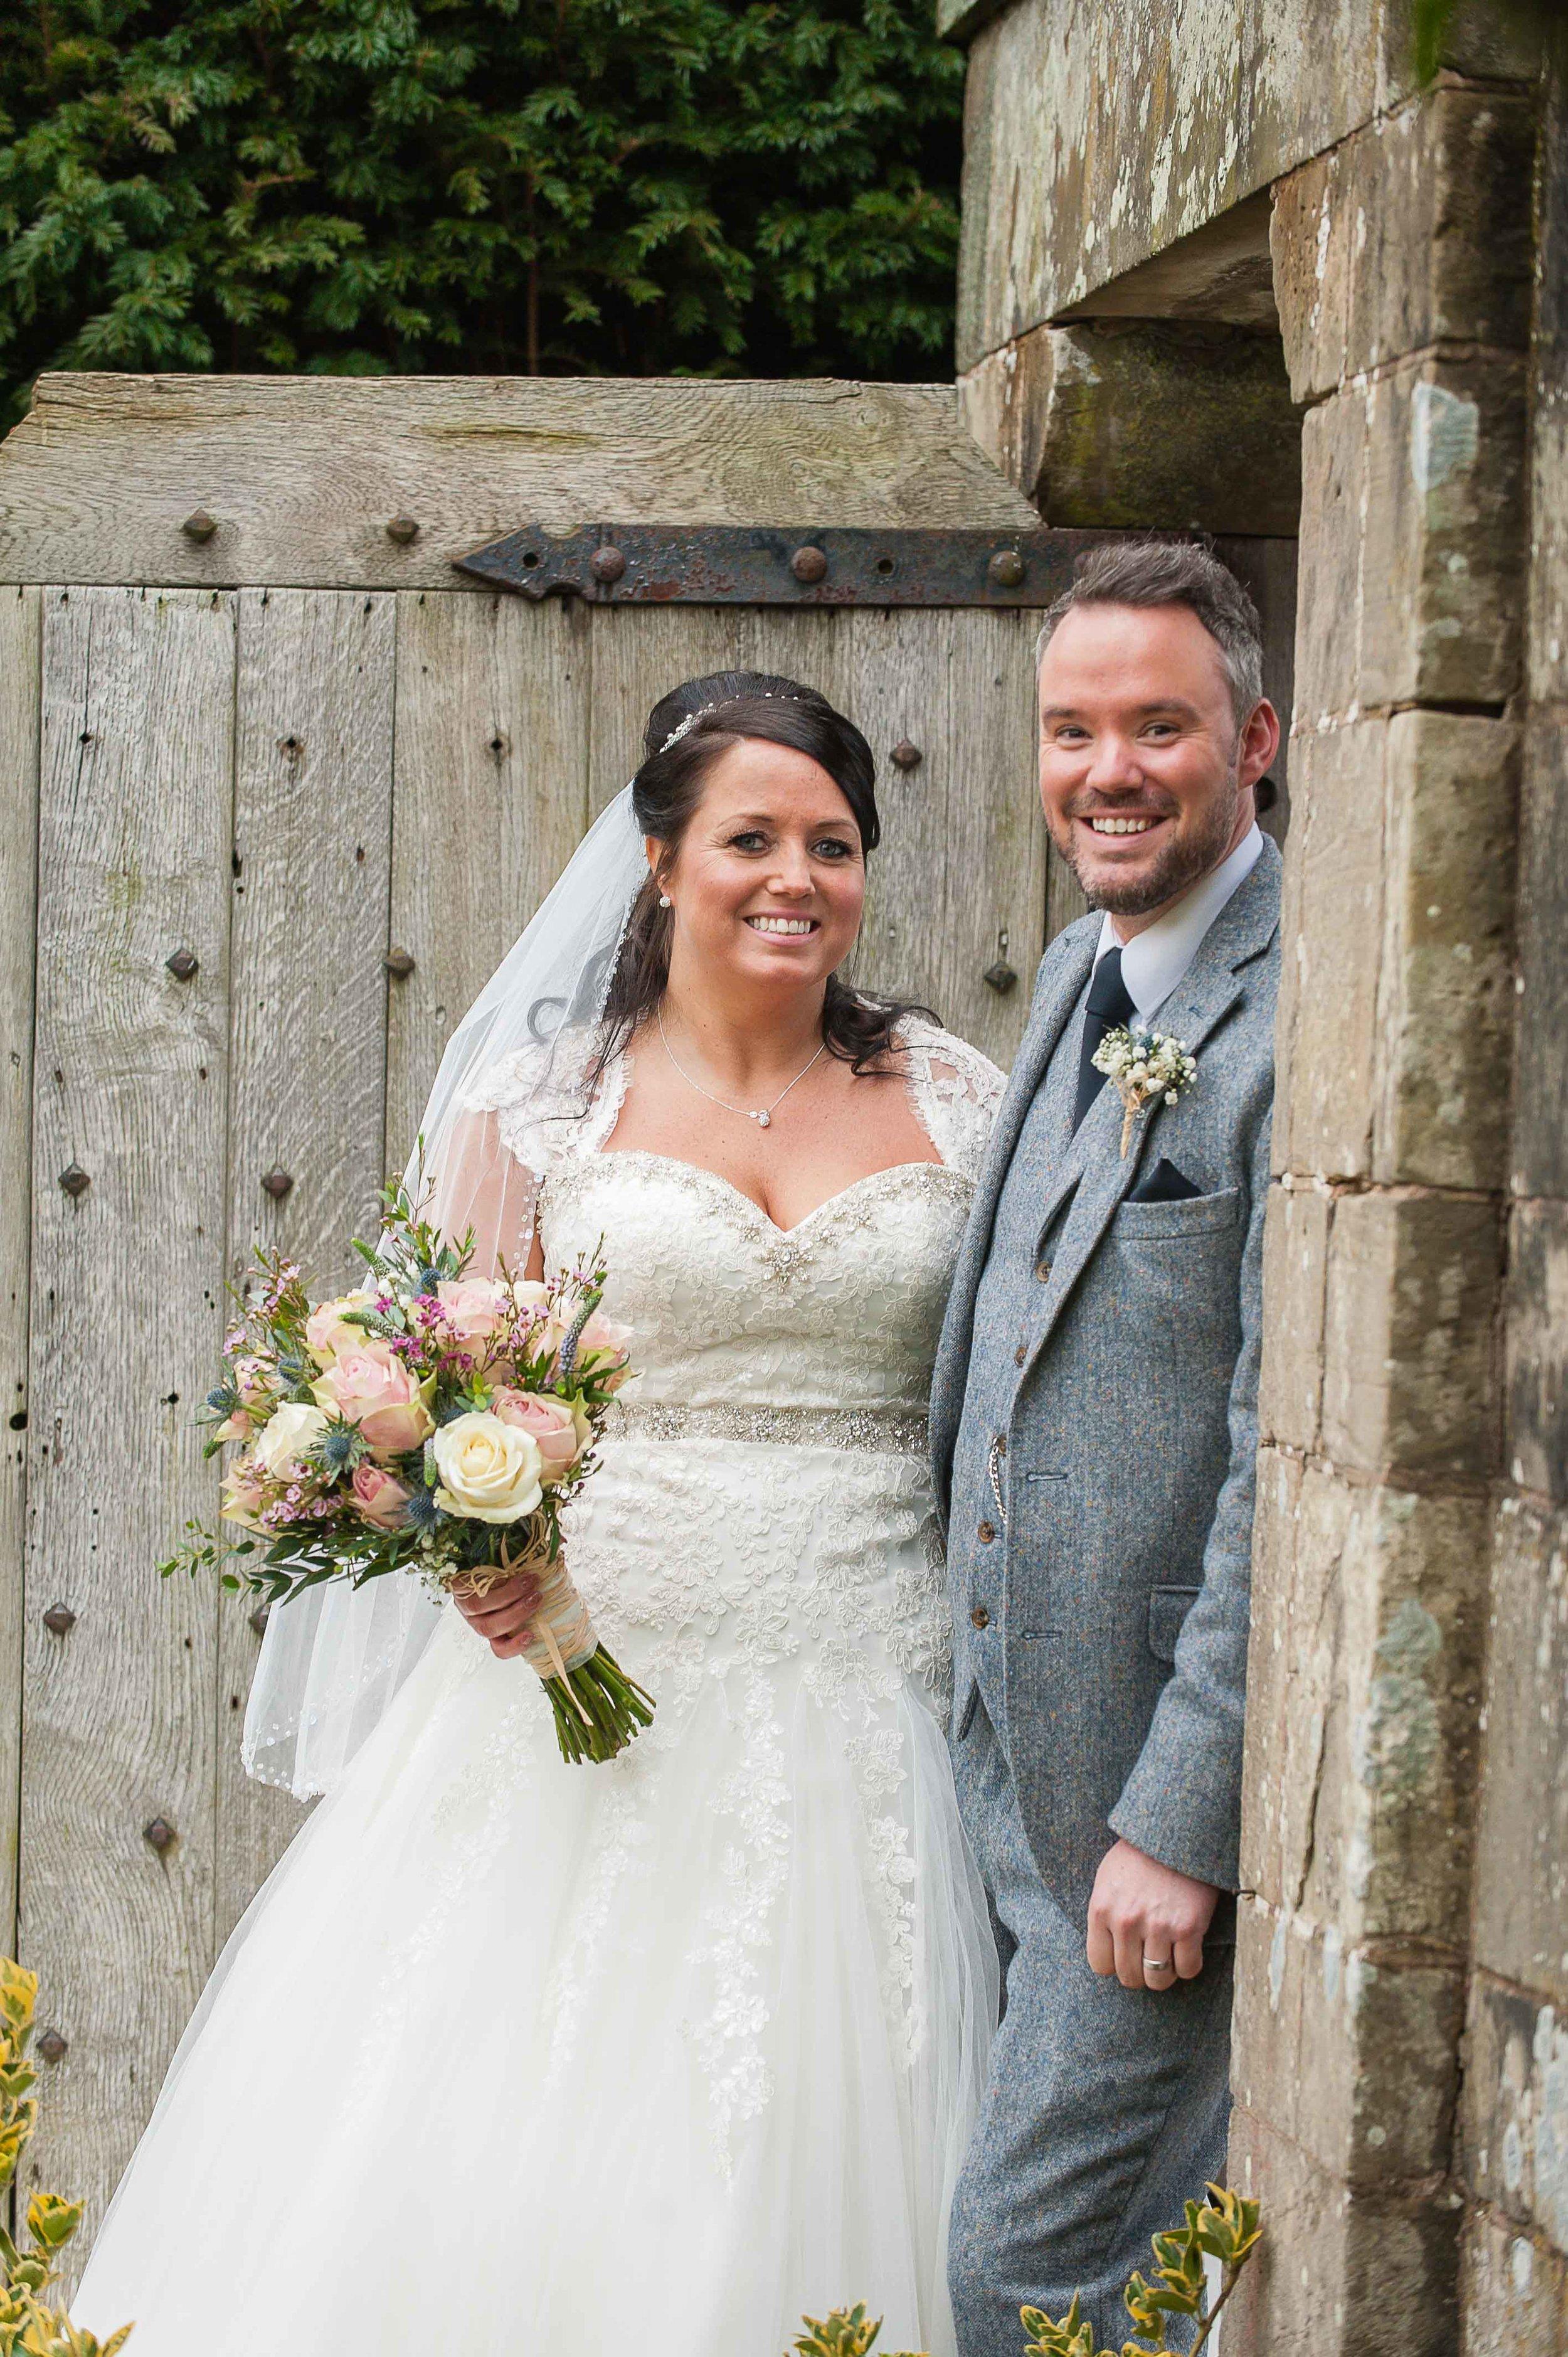 14.02.17 - Matt-Faye-Coombe-Abbey-Valentine-Wedding-Charnwood-Photography-1074.jpg